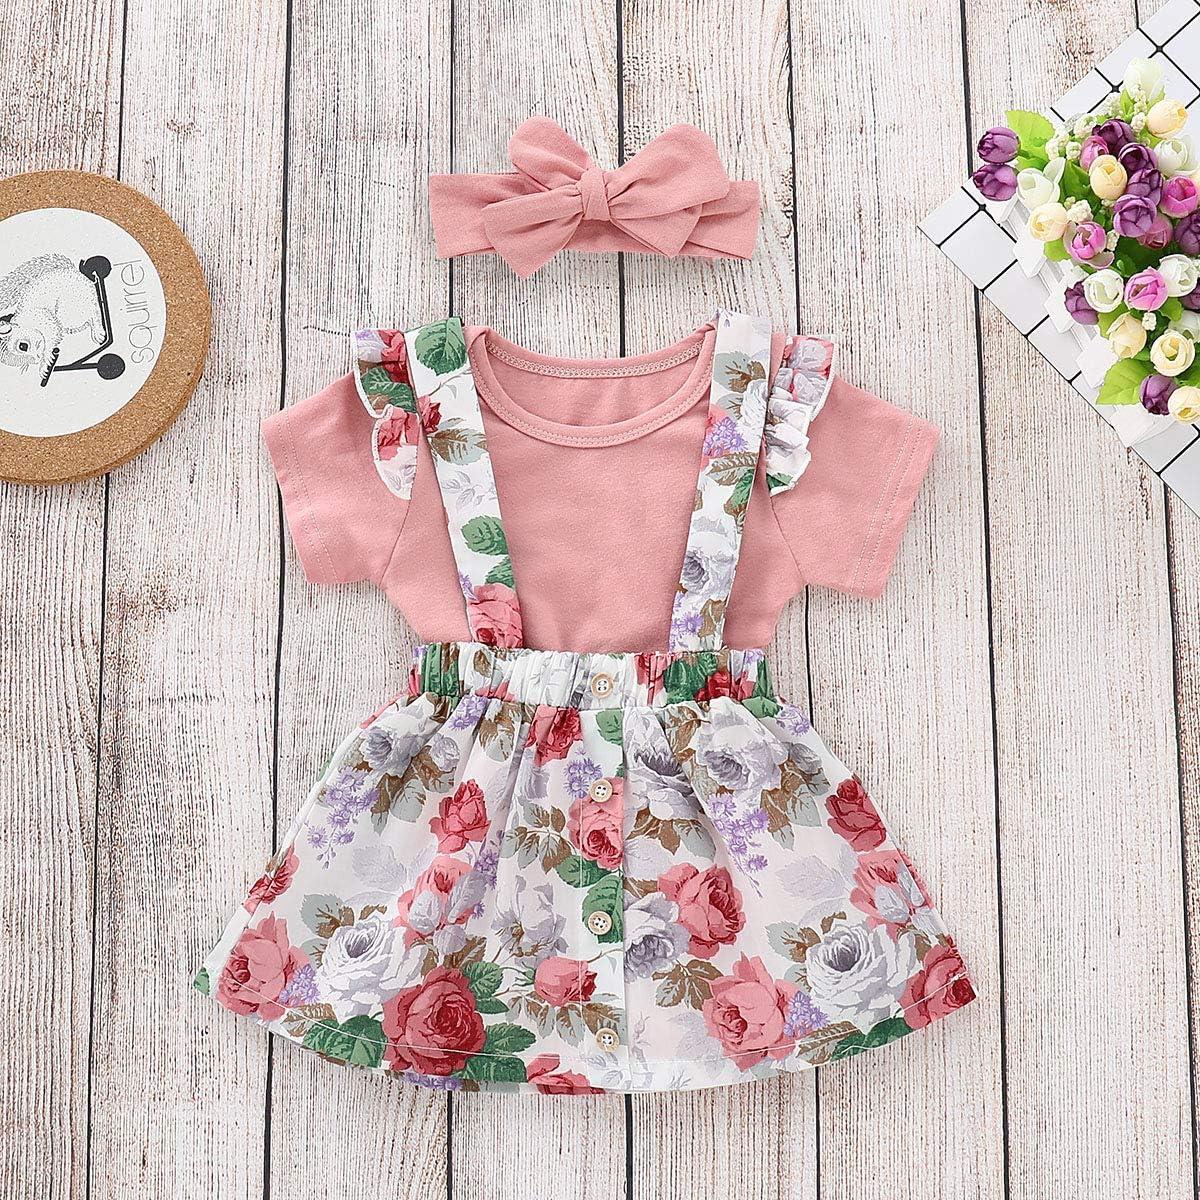 Newborn Toddler Girls Skirt Sets Short Sleeve Leaf Print Romper Bodysuit Floral Suspender Skirt with Headband Summer Clothes